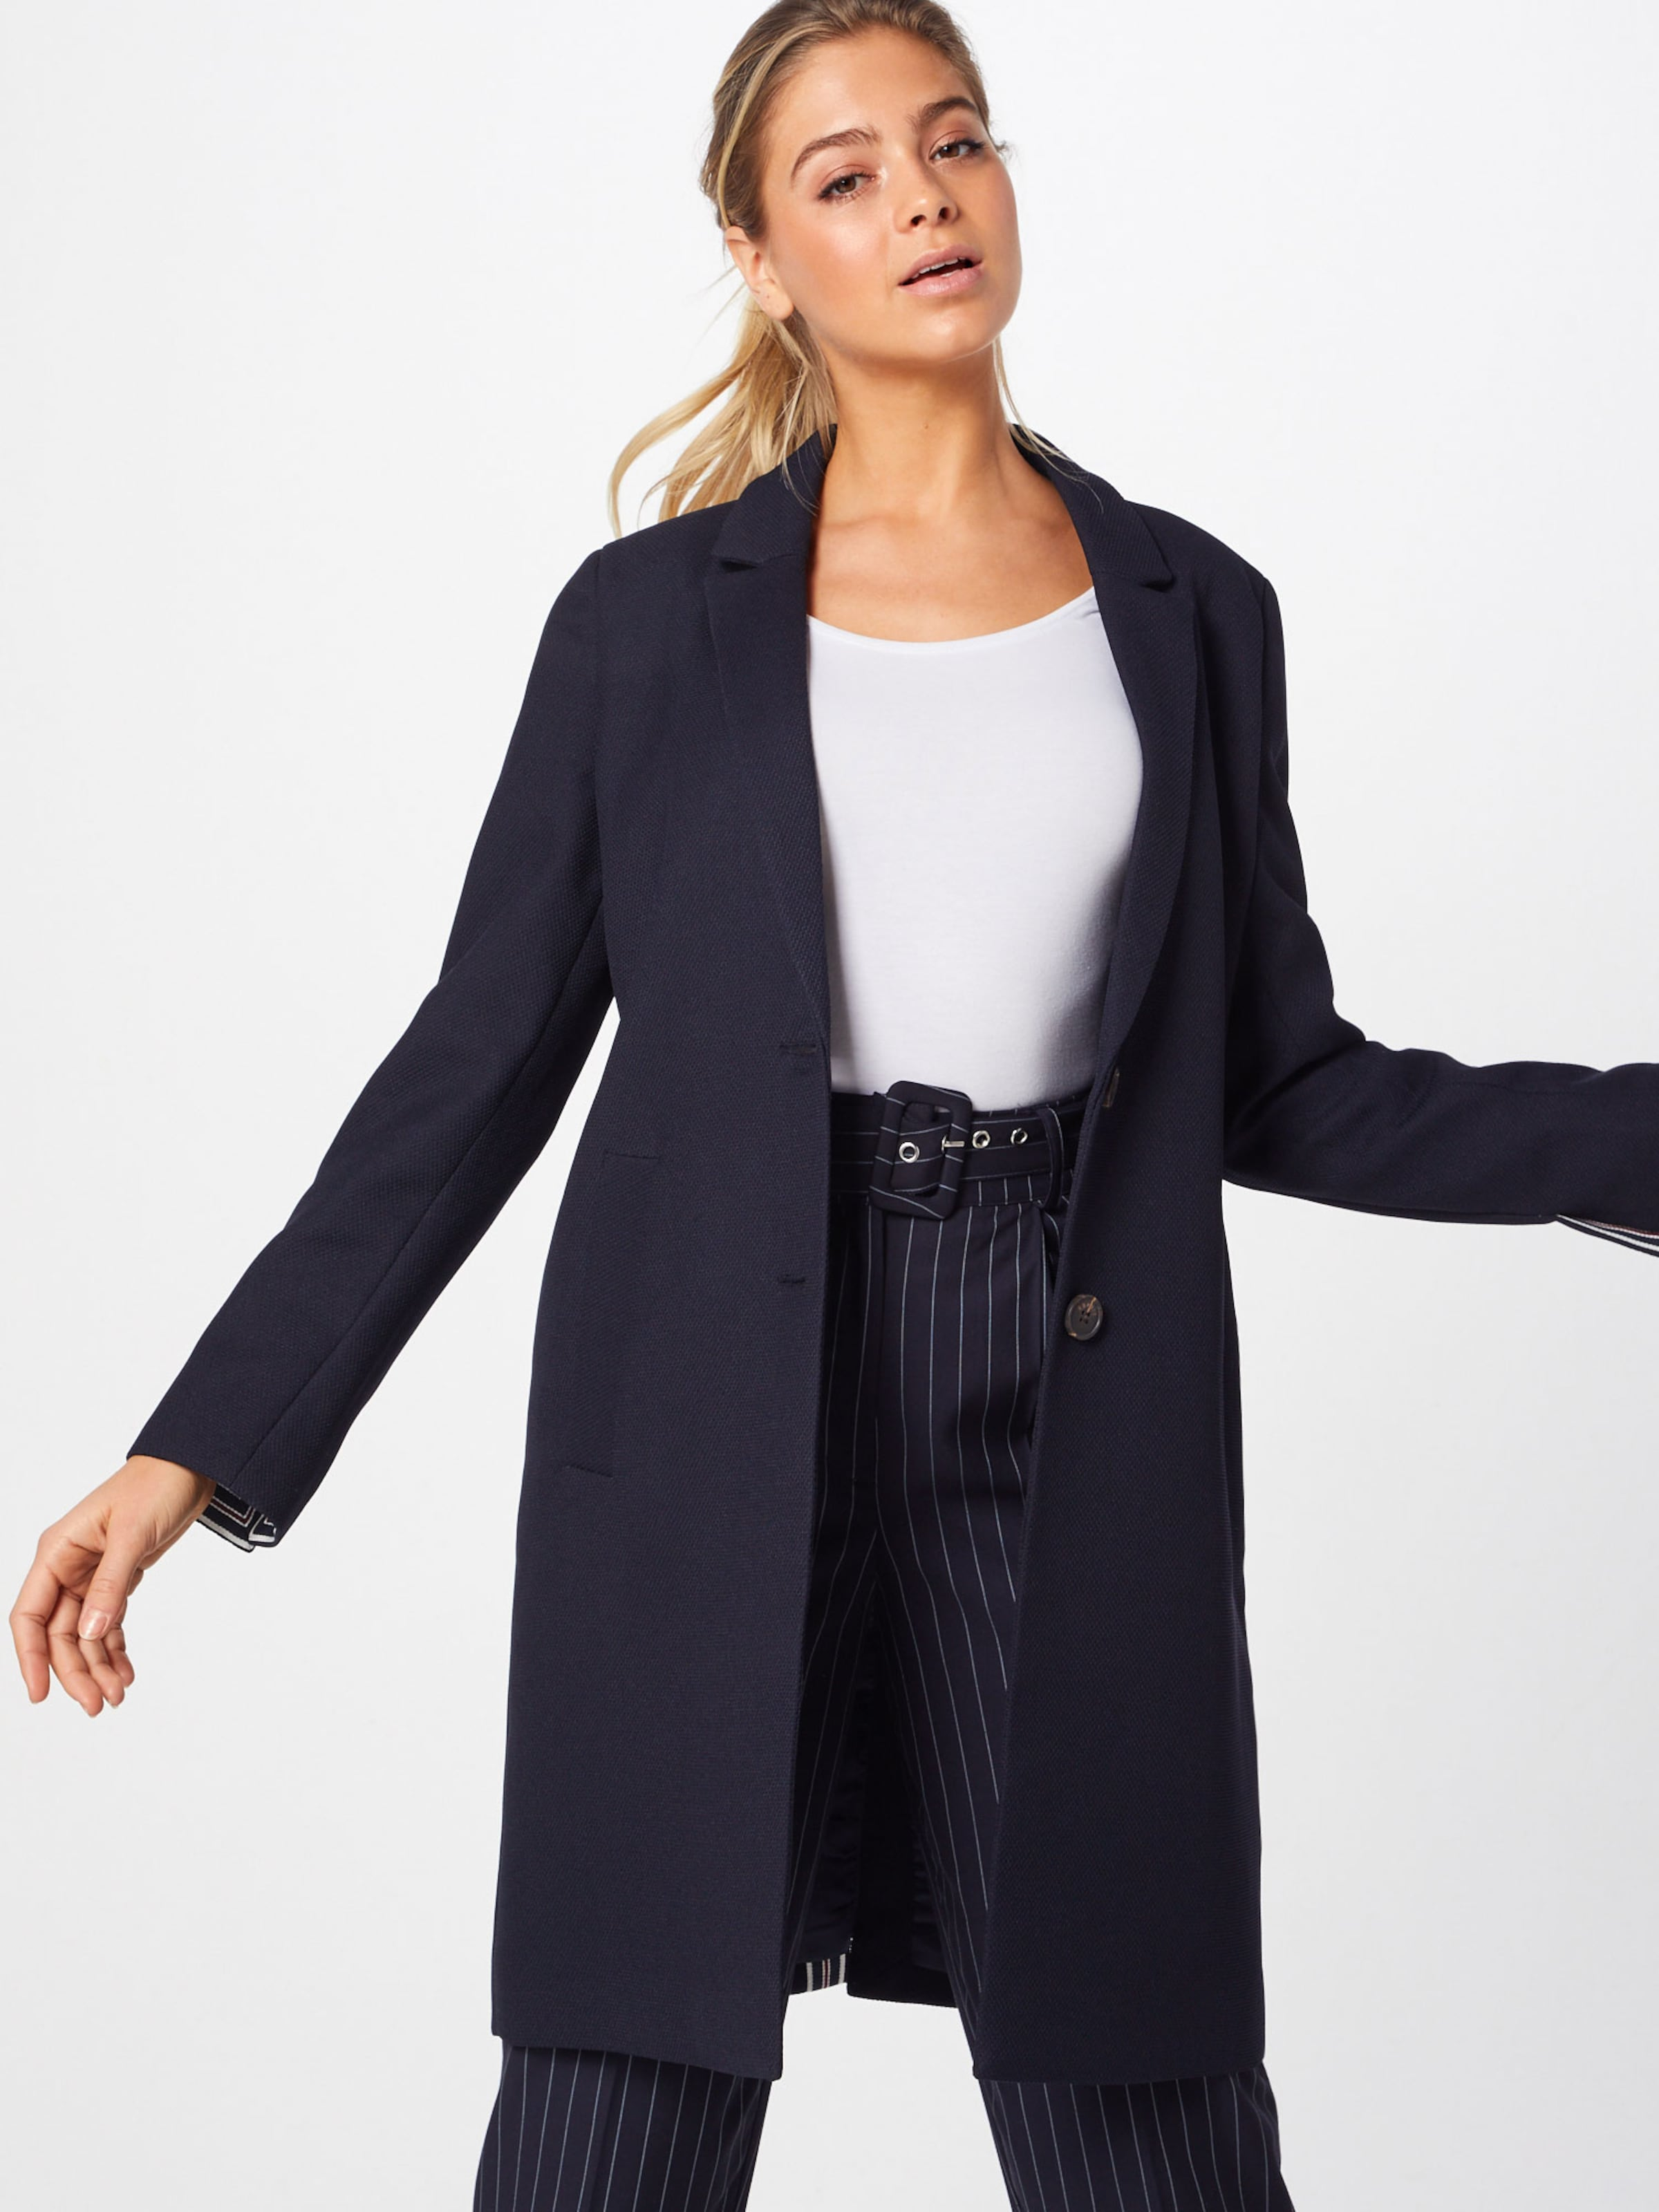 Manteau saison Bleu Marine Esprit En Mi Yf6gv7yb